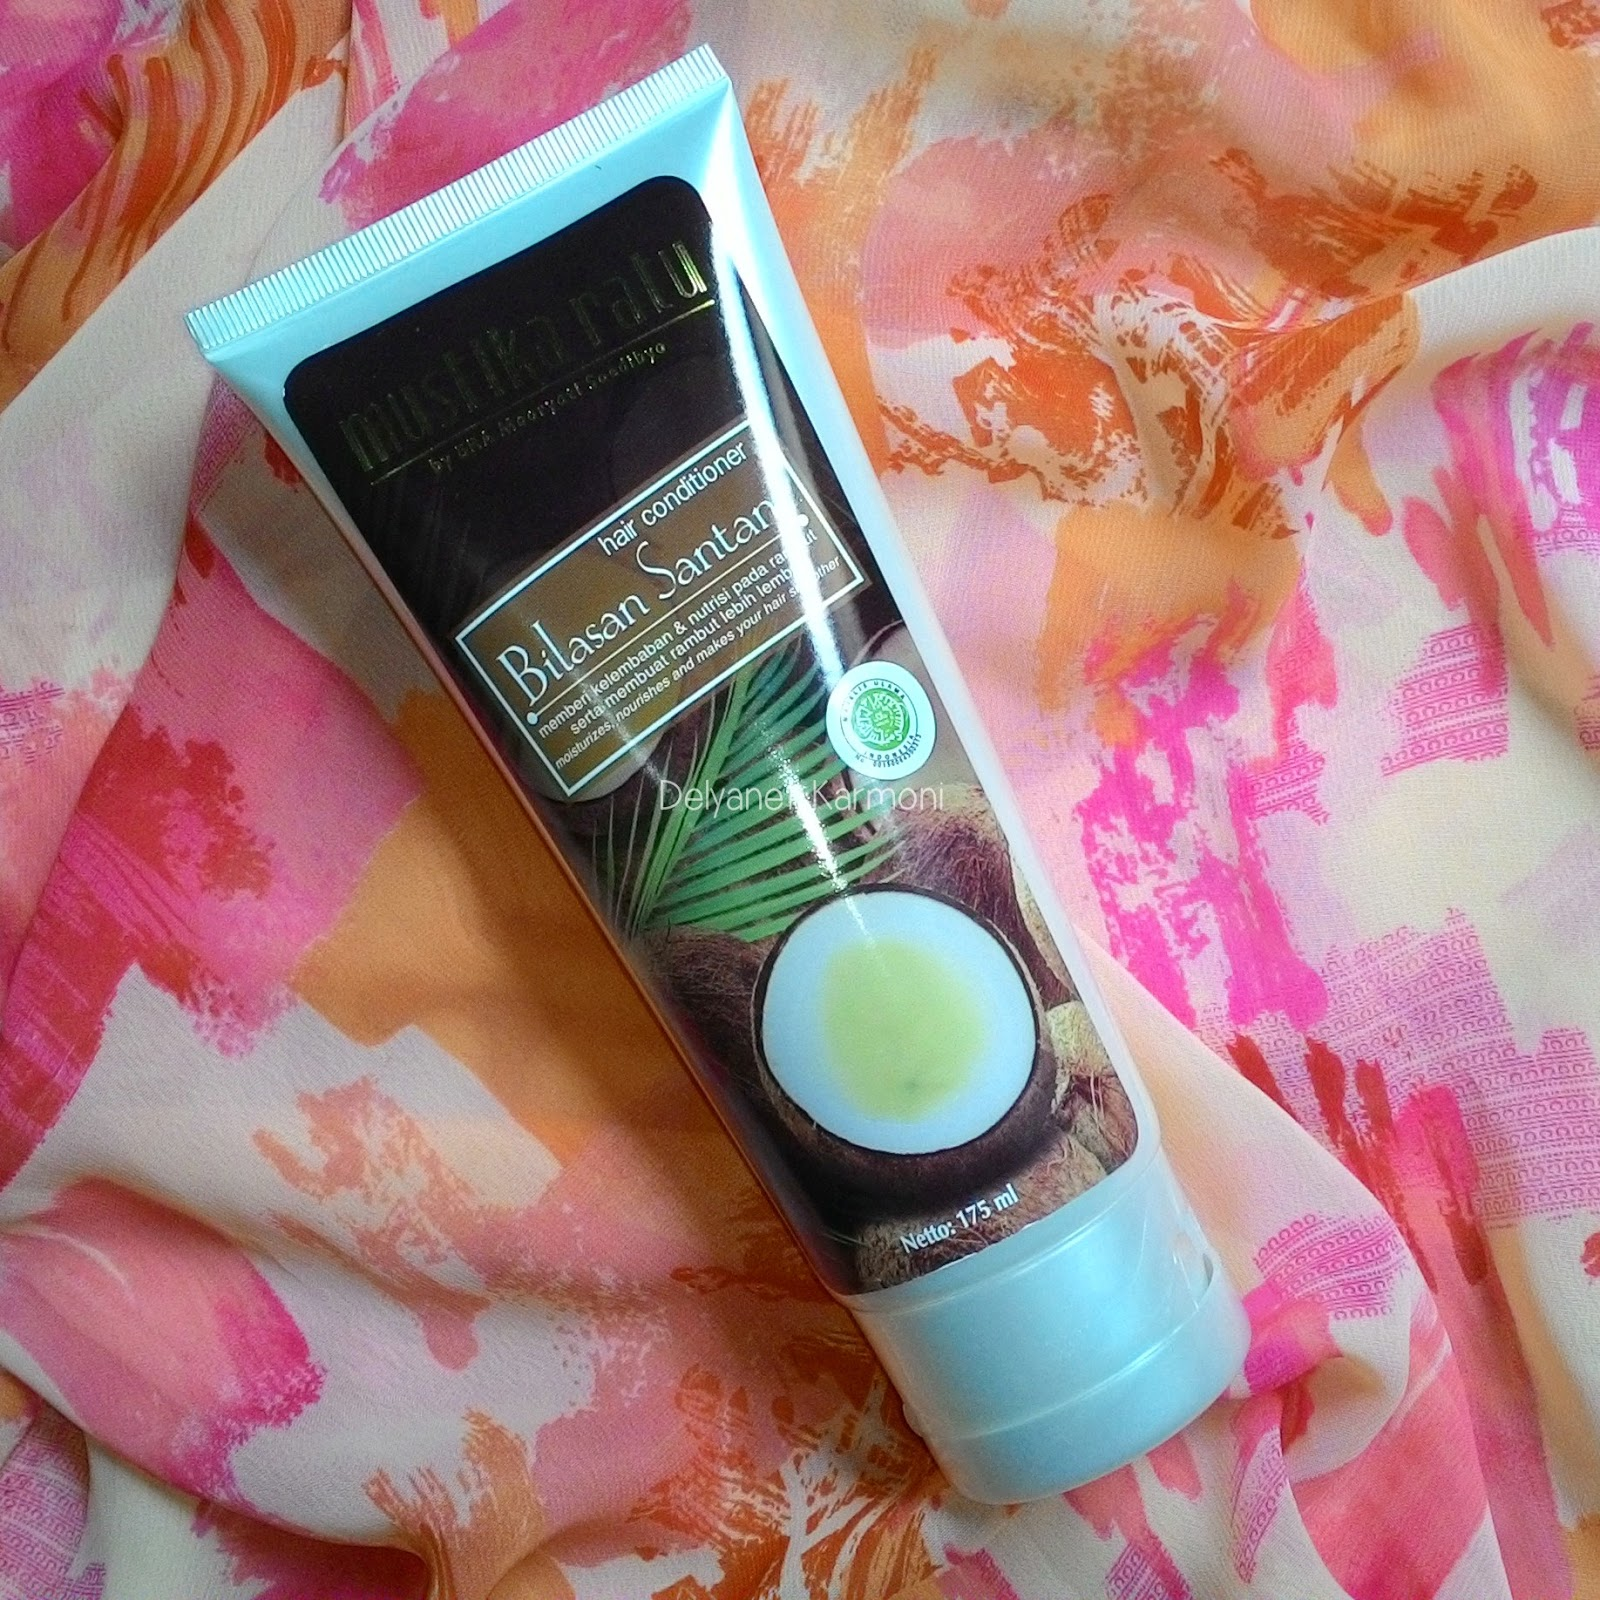 mustika ratu 2018-8-16 manfaatonlinecom – salam sehat manfaaat minyak zaitun mustika ratu dan review produk minyak zaitun mustika ratu minyak yang berasal dari.